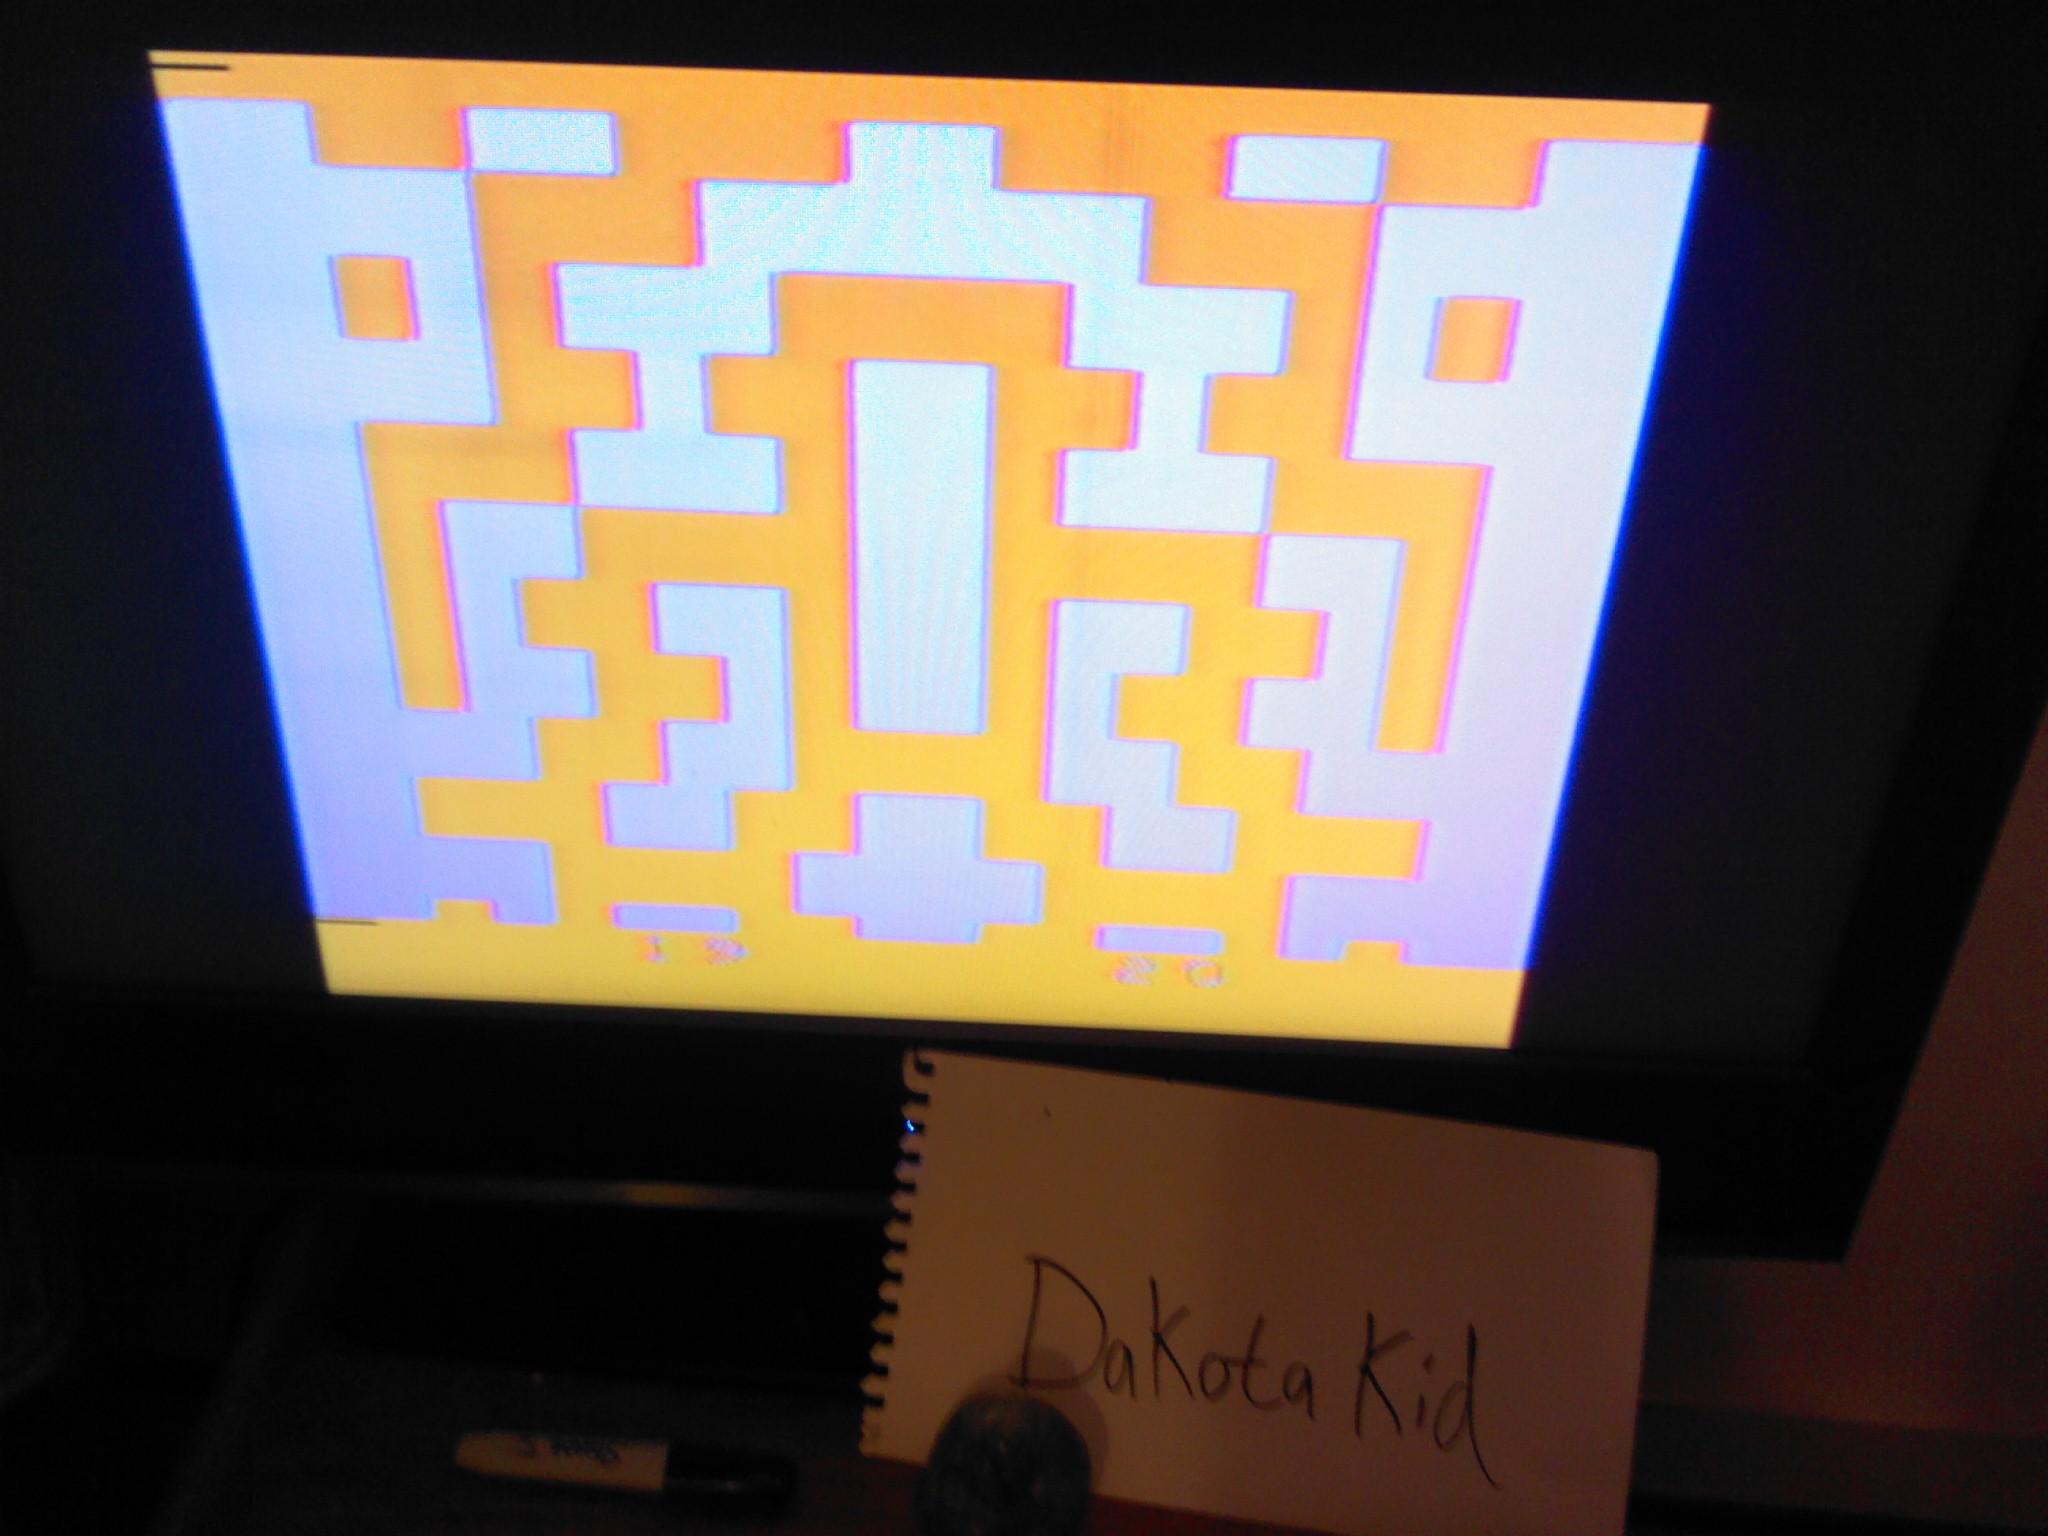 DakotaKid: Entombed (Atari 2600 Novice/B) 20 points on 2014-05-17 19:49:58